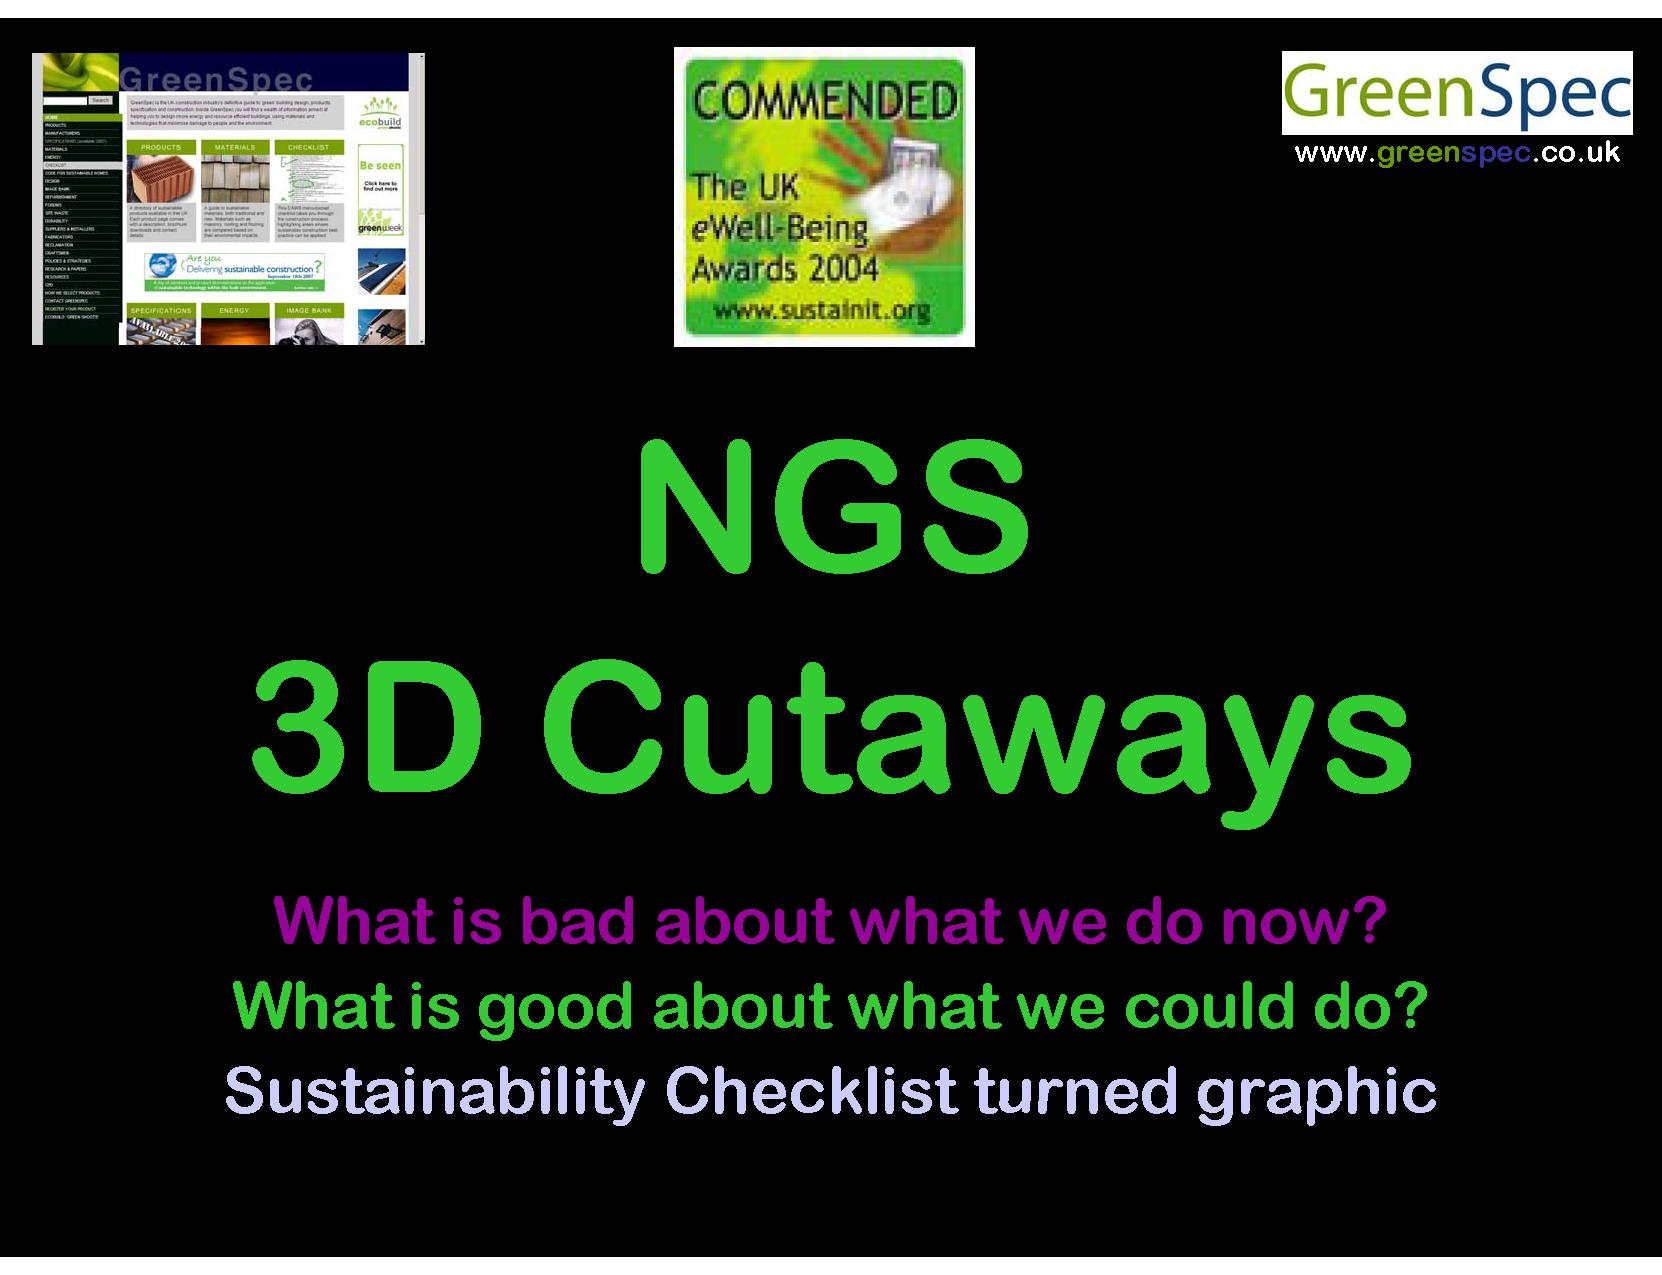 GreenSpec3DCutaways_Page_1.png